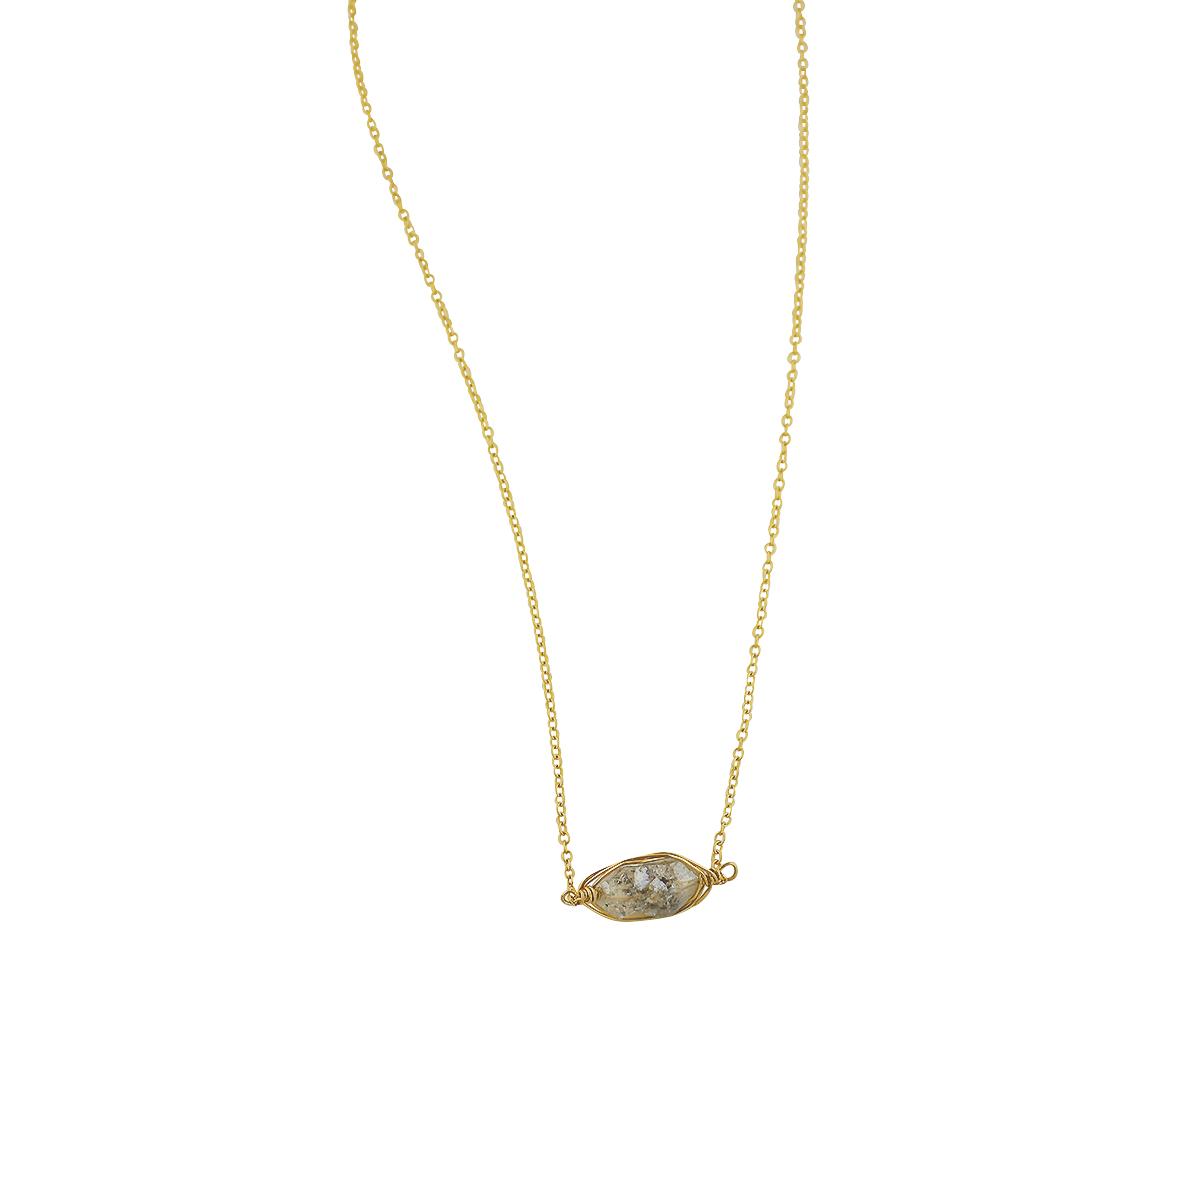 Illumine herkimer diamond necklace susan ankersen jewelry illumine herkimer diamond necklace aloadofball Gallery